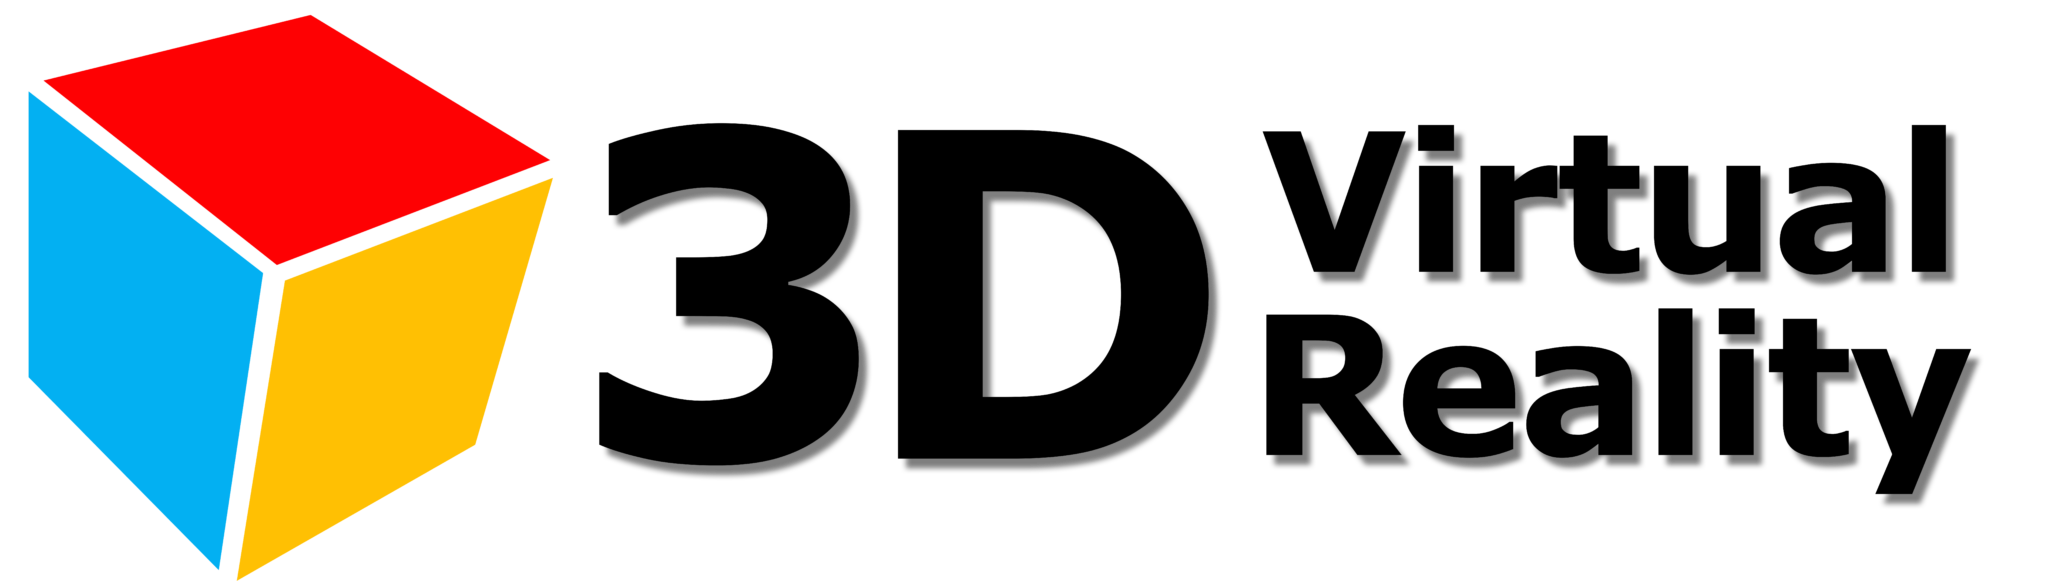 3dvire